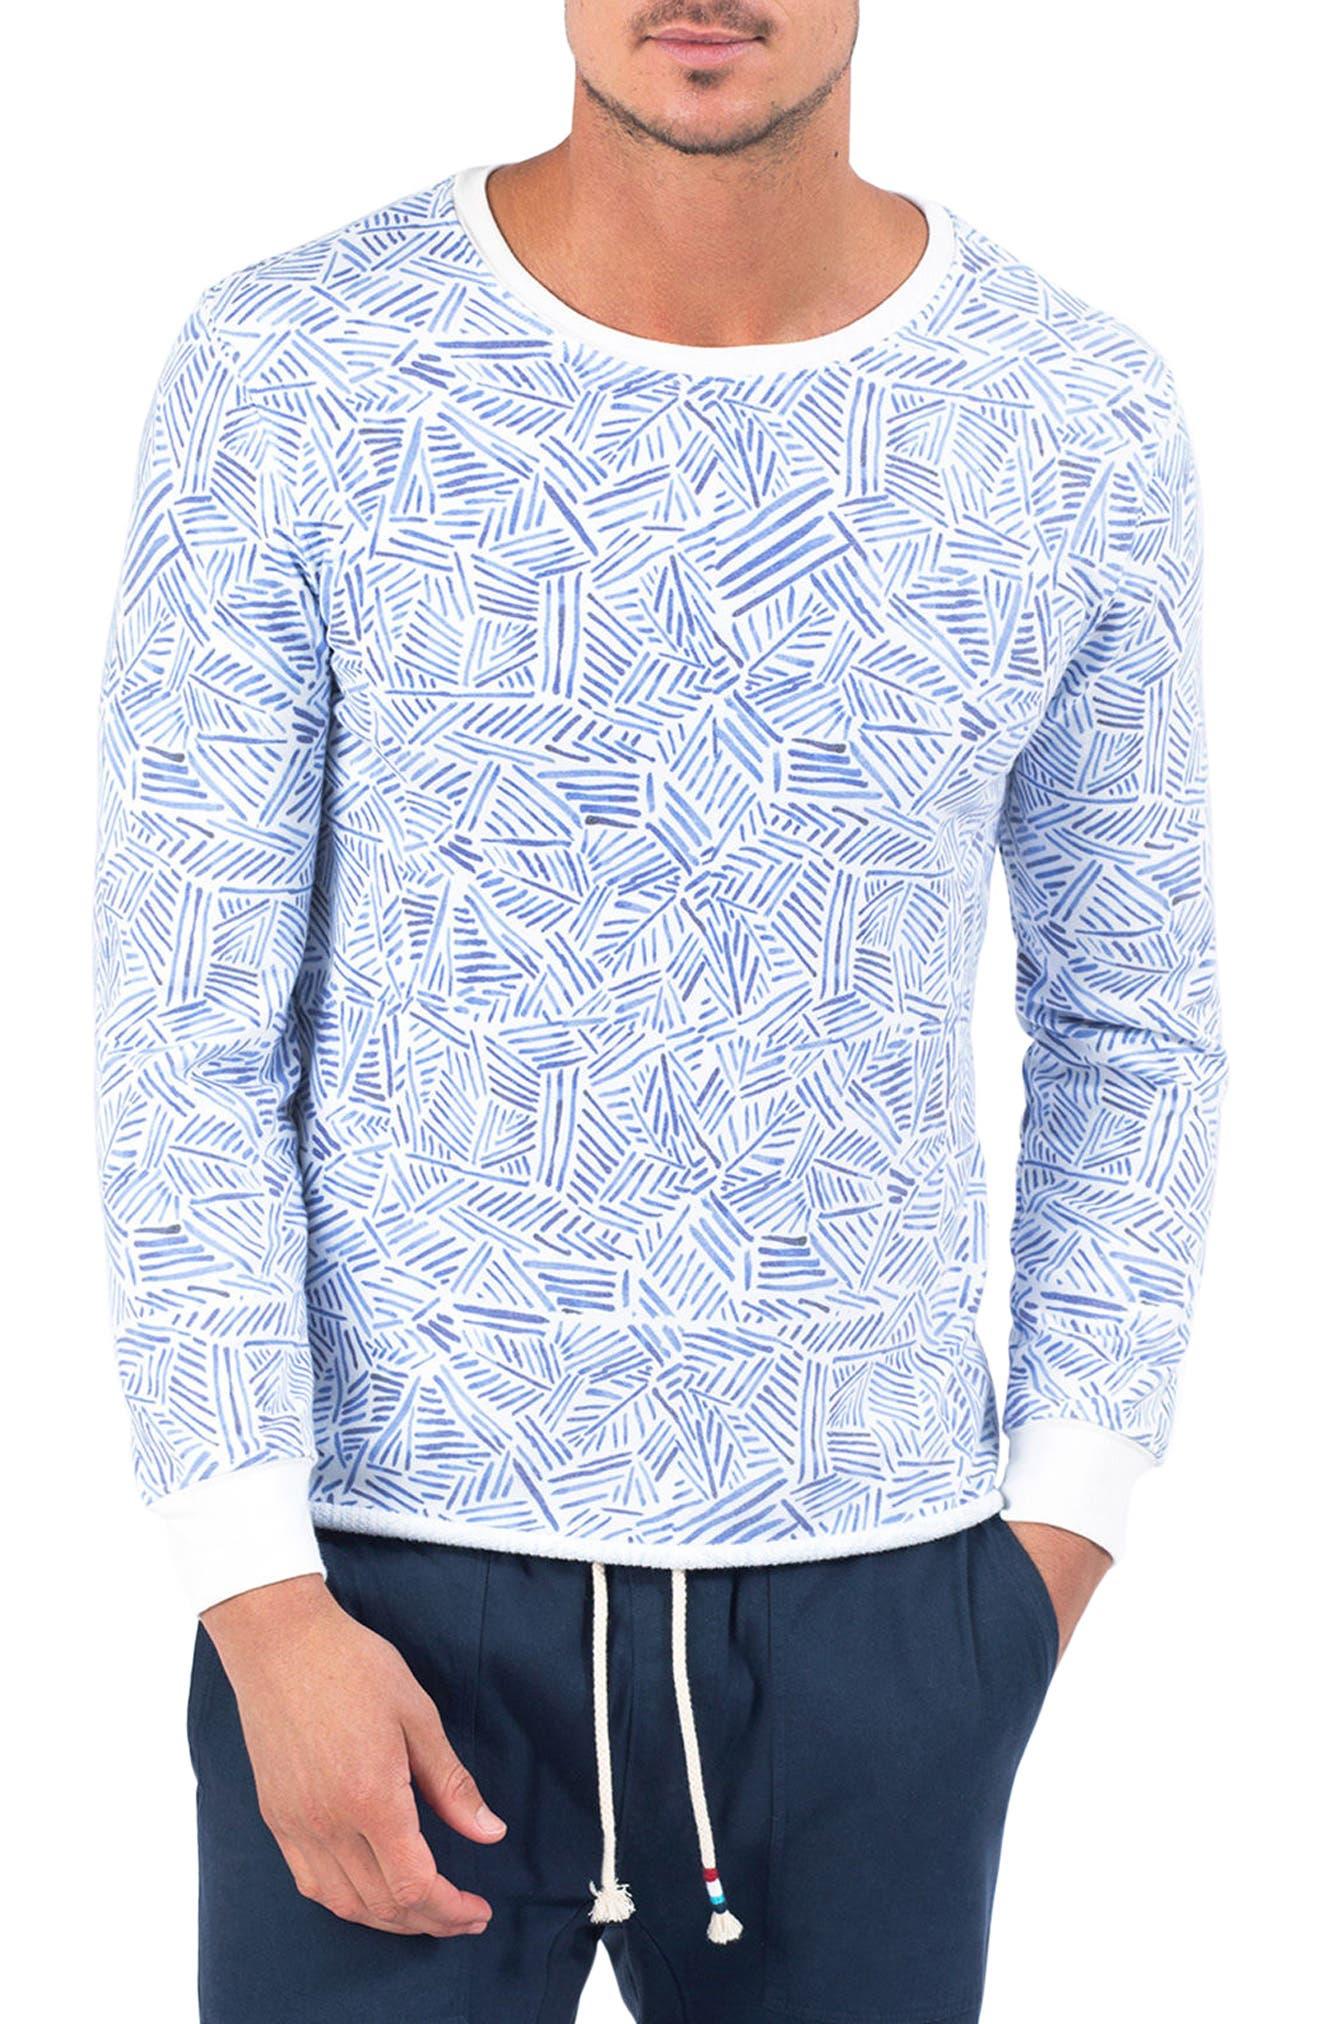 Habana Blues Fleece Pullover,                         Main,                         color, HABANA BLUES